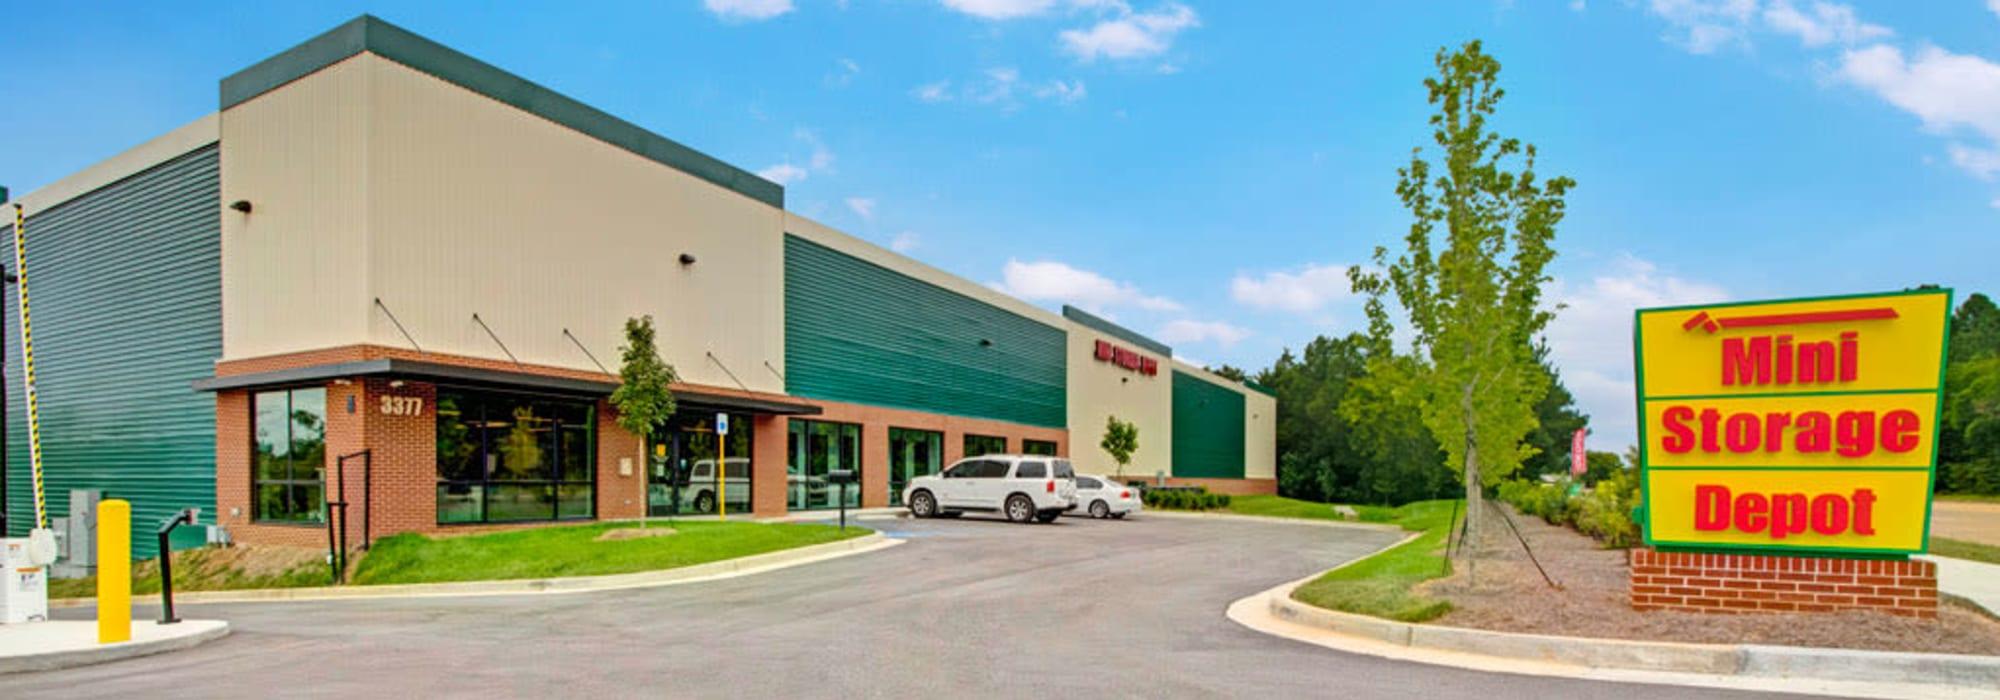 Mini Storage Depot in Fairfield Township, Ohio